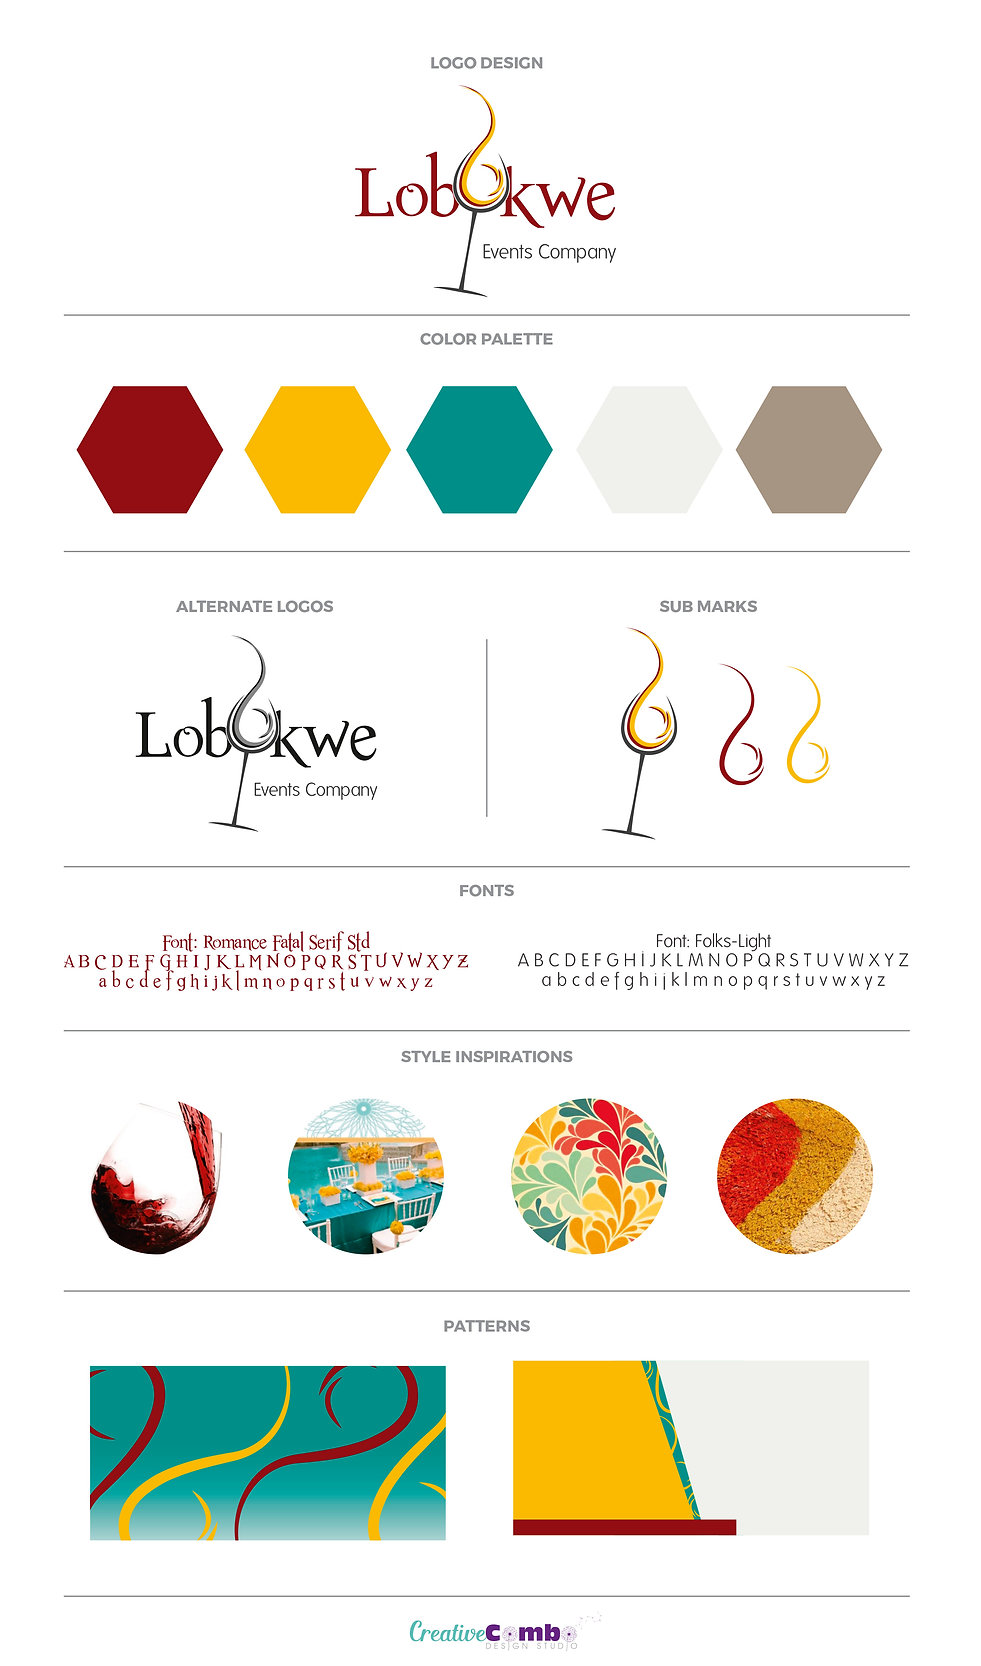 Lobukwe Events Company Brand Design